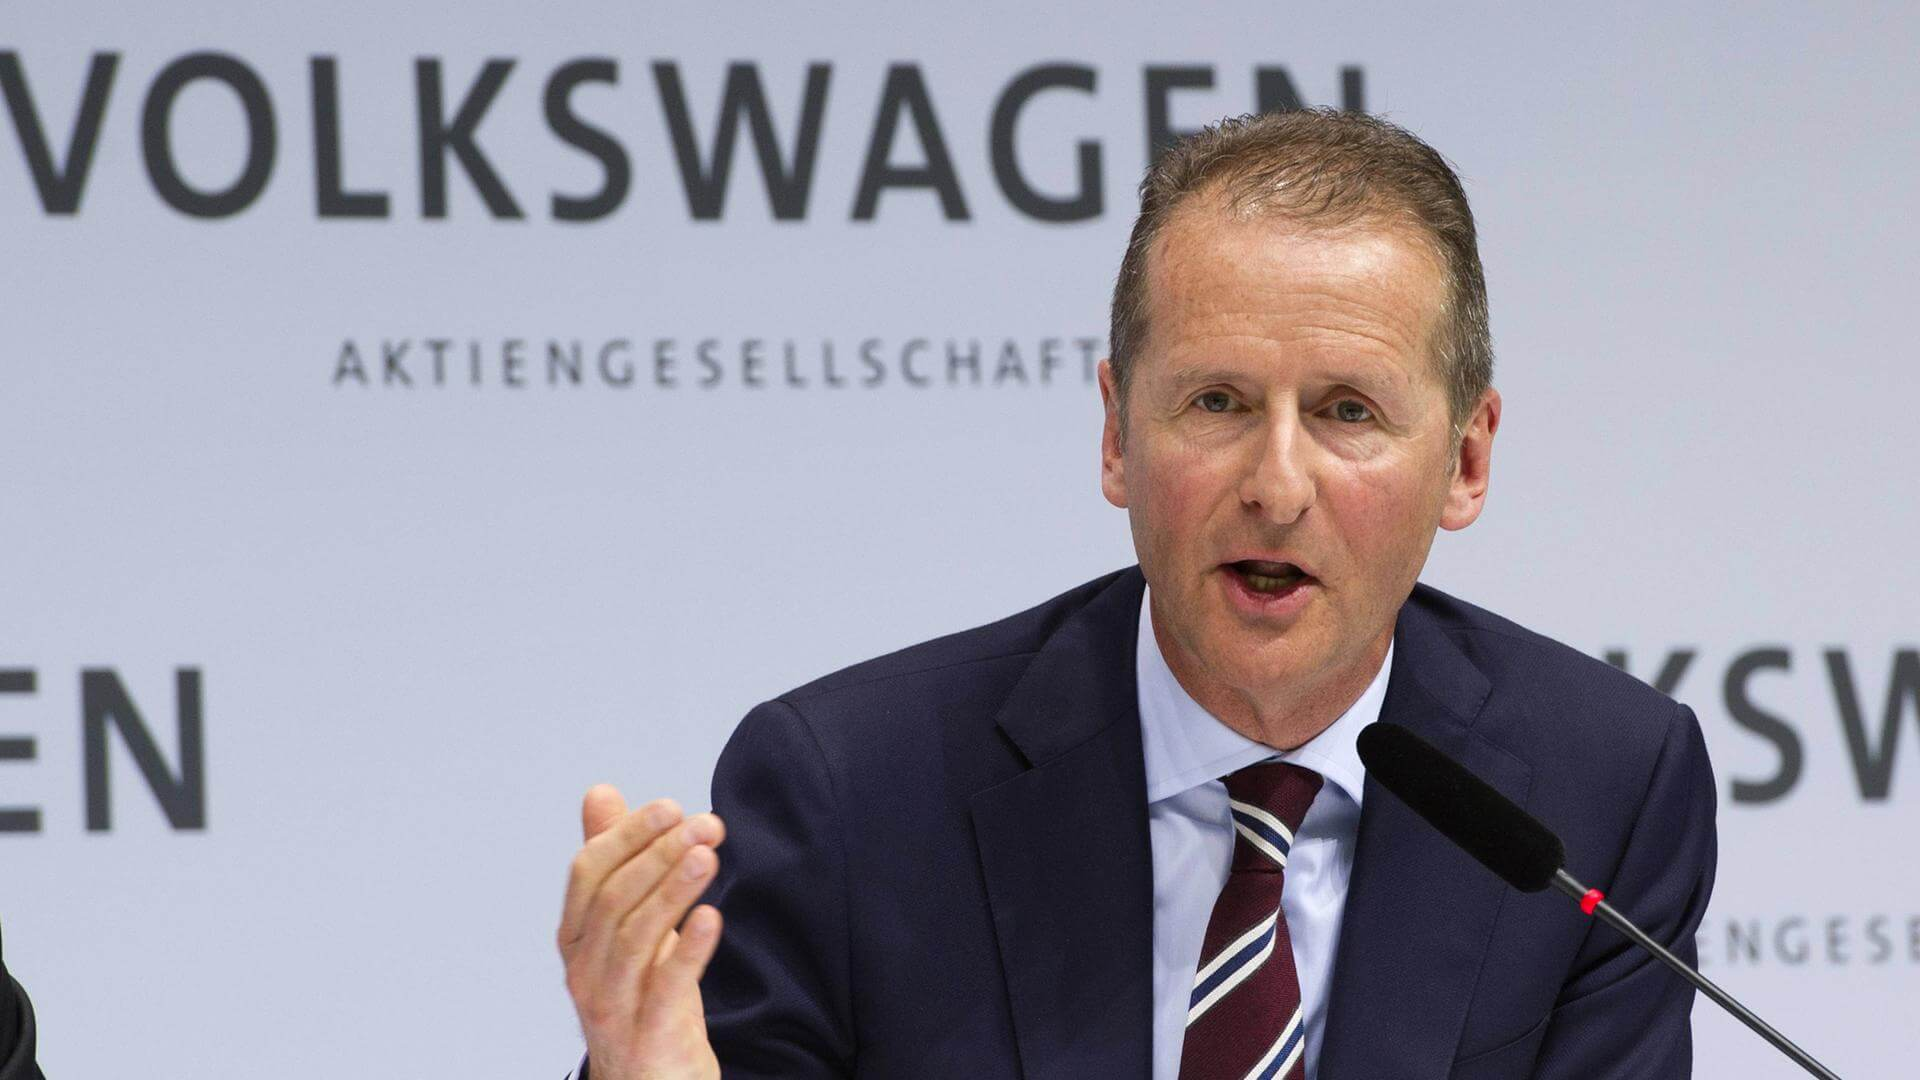 Herbert Diess zieht bei VW die Zügel an